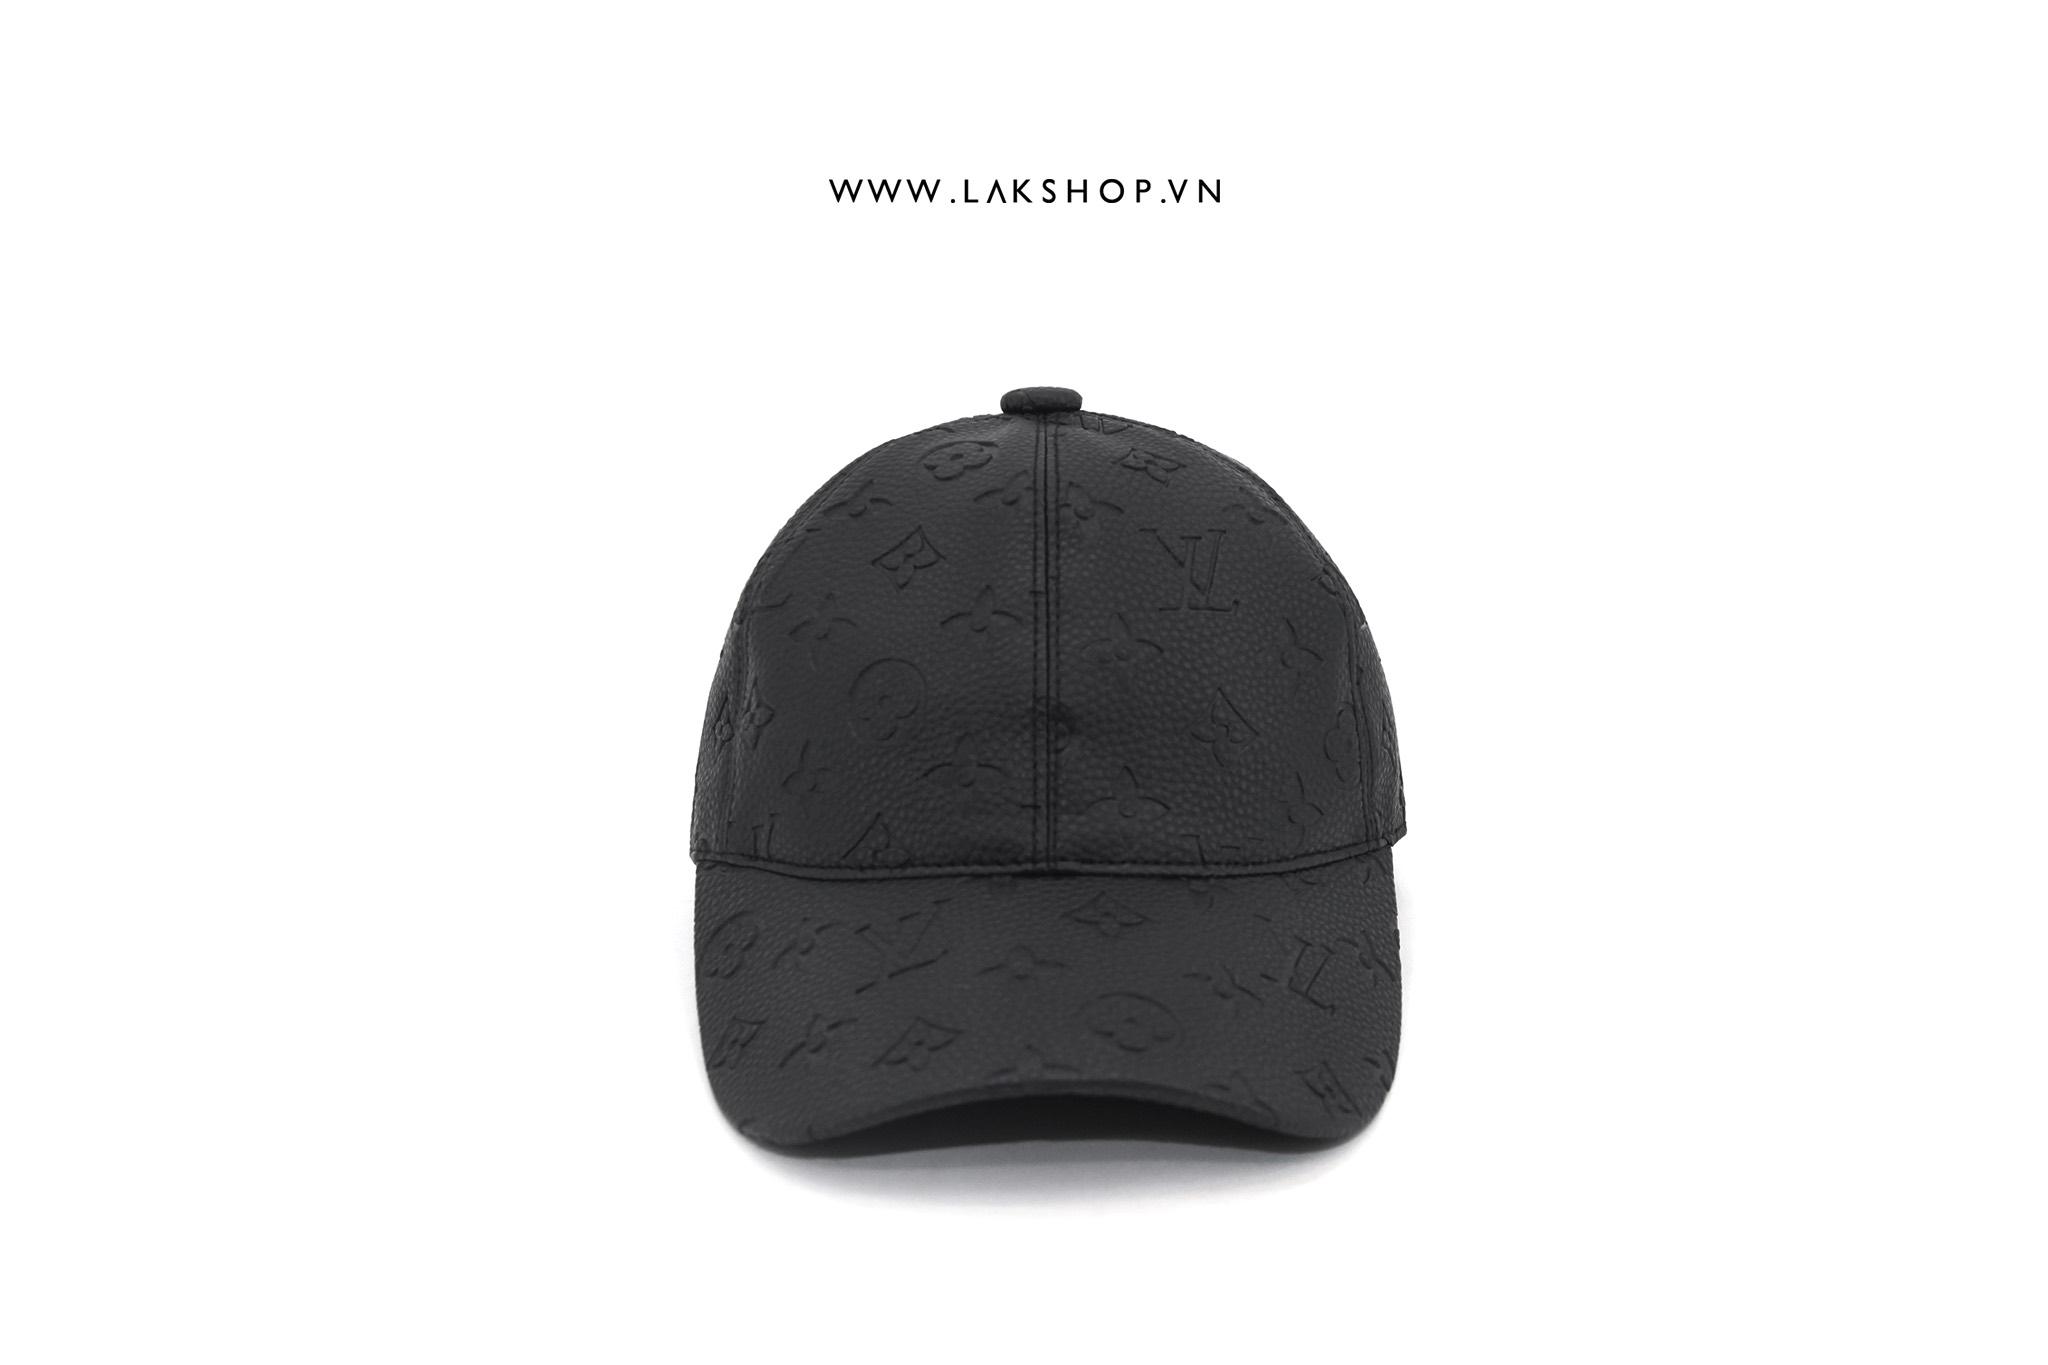 Louis Vuitton Monogram Black Leather Baseball Cap